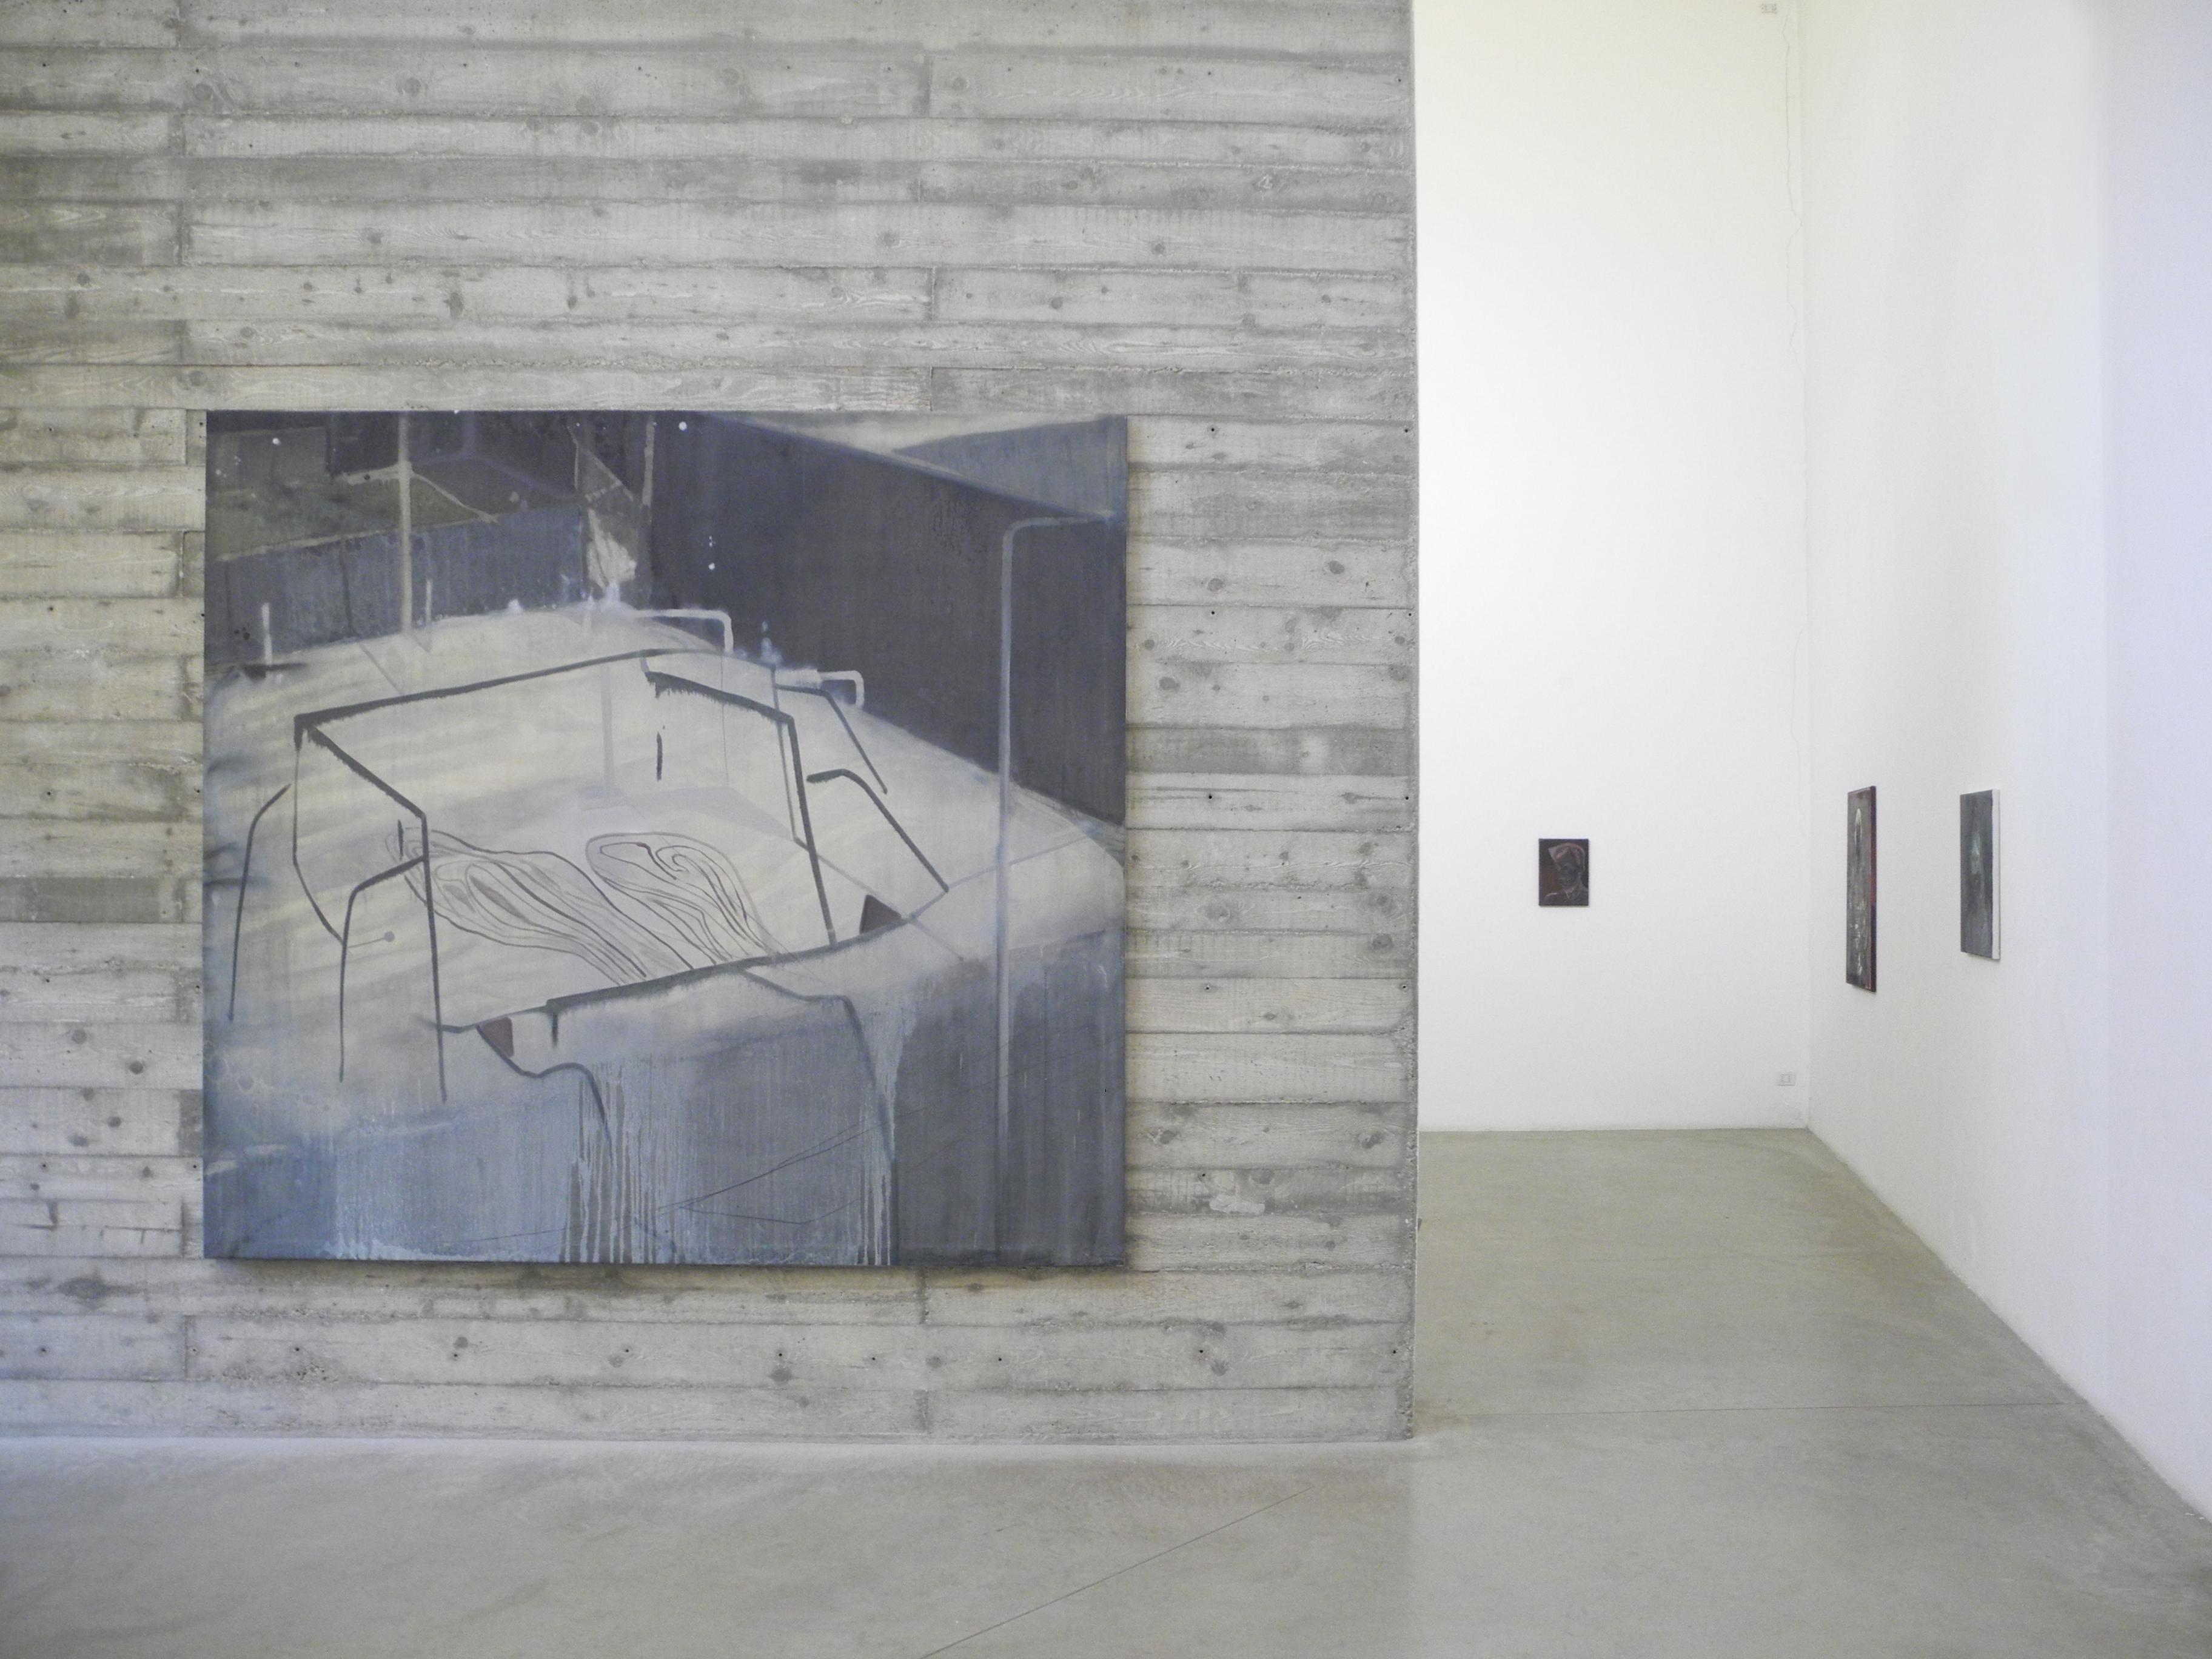 Nebojsa Despotovic, Installation view, Boccanera T gallery, via Ventura 6, Milano